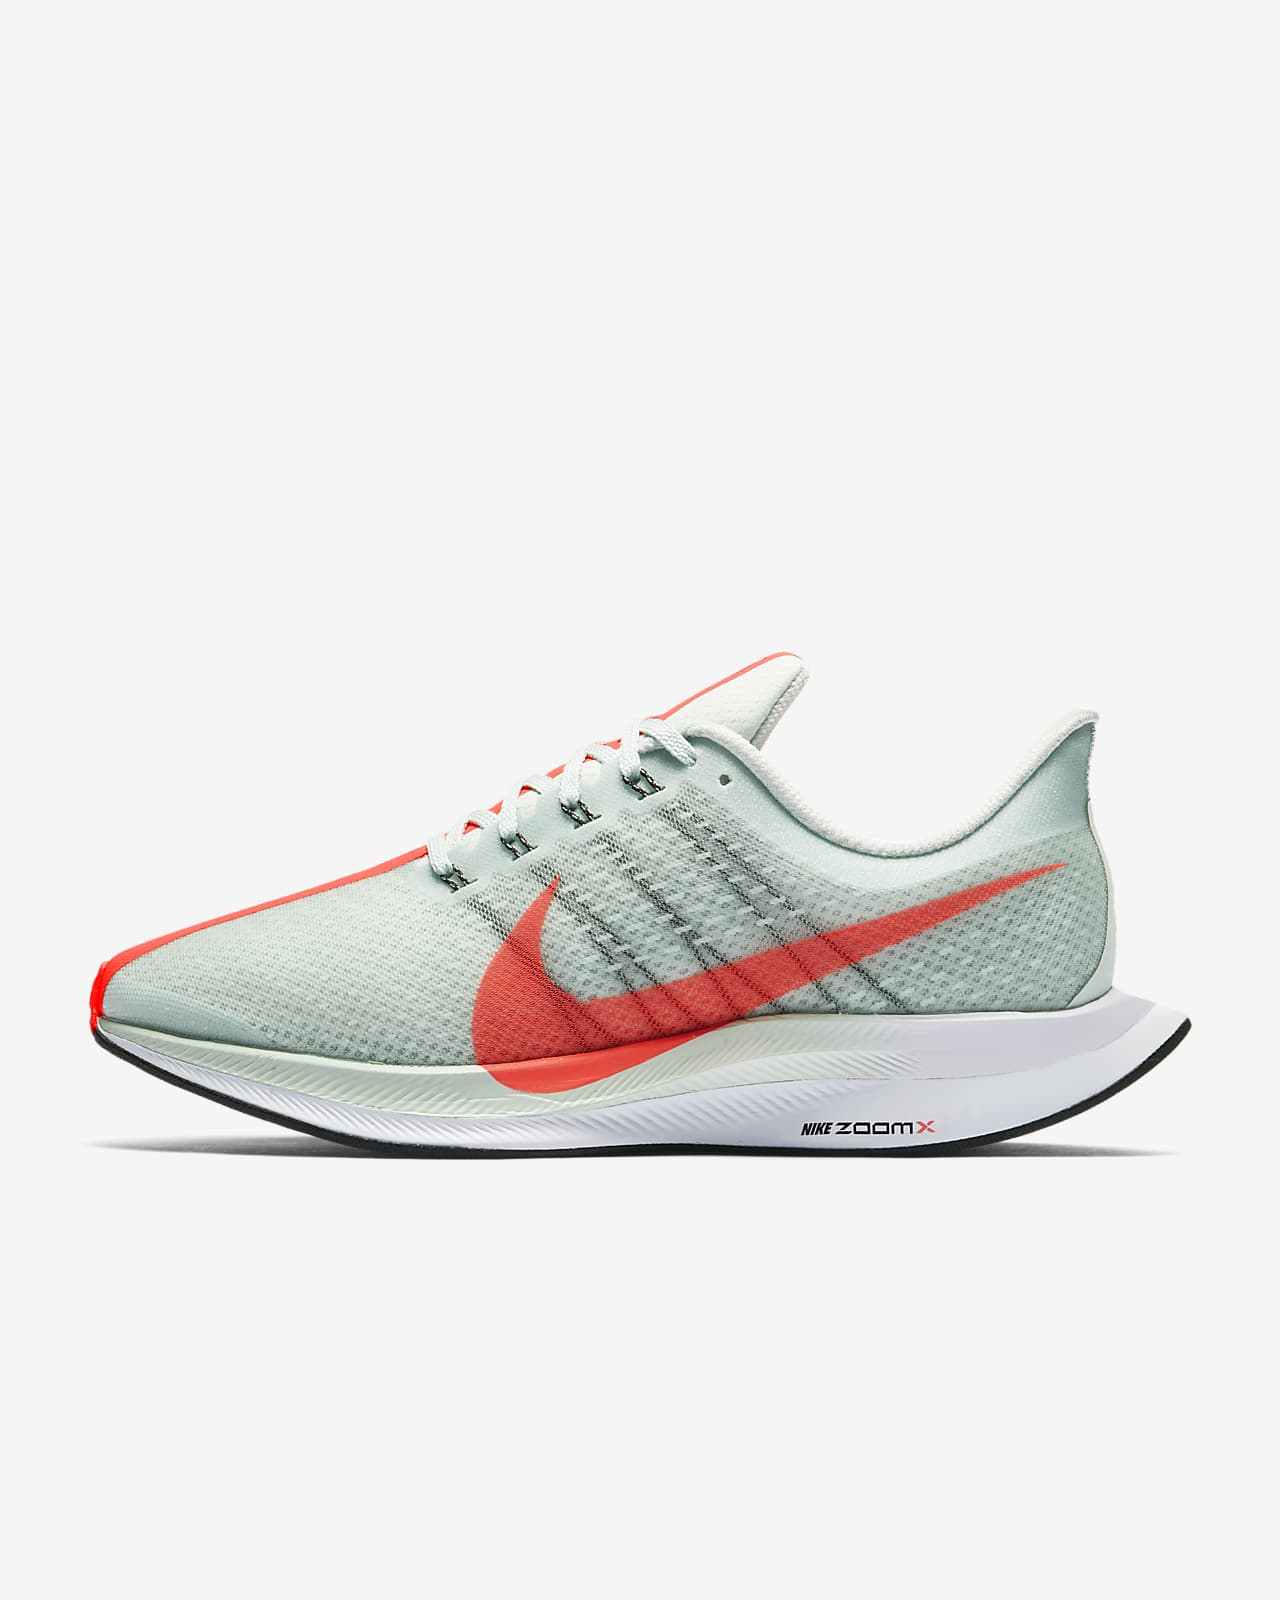 nadar Elegancia Específico  Nike Zoom Pegasus Turbo Women's Running Shoe. Nike ID